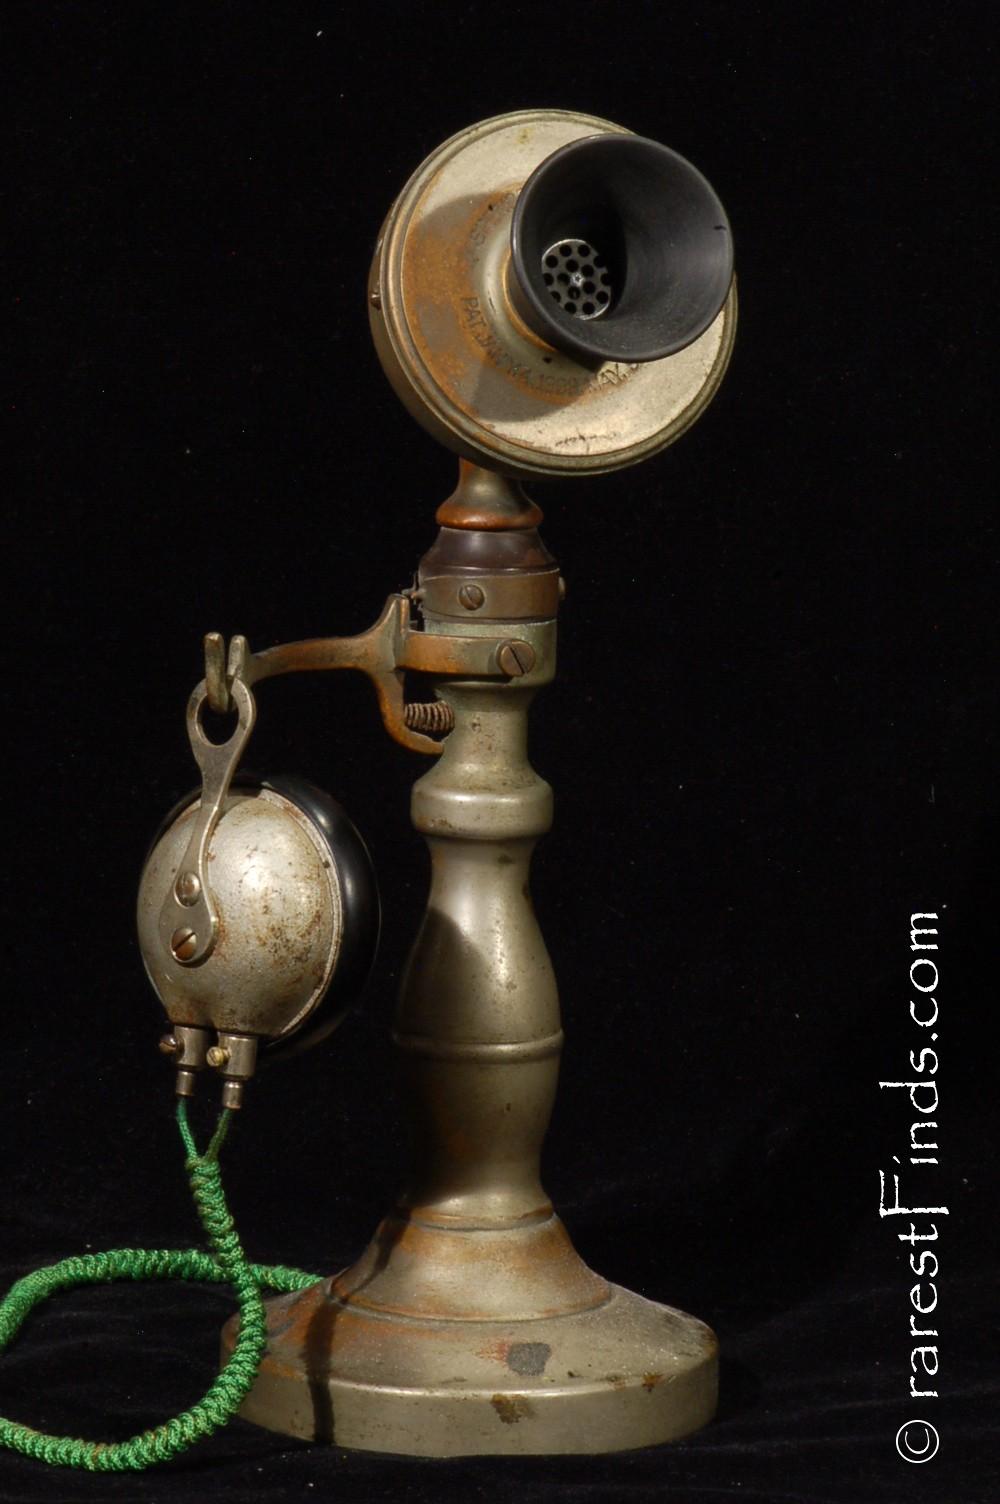 Spencer-Potbelly-Candlestick-Telephone